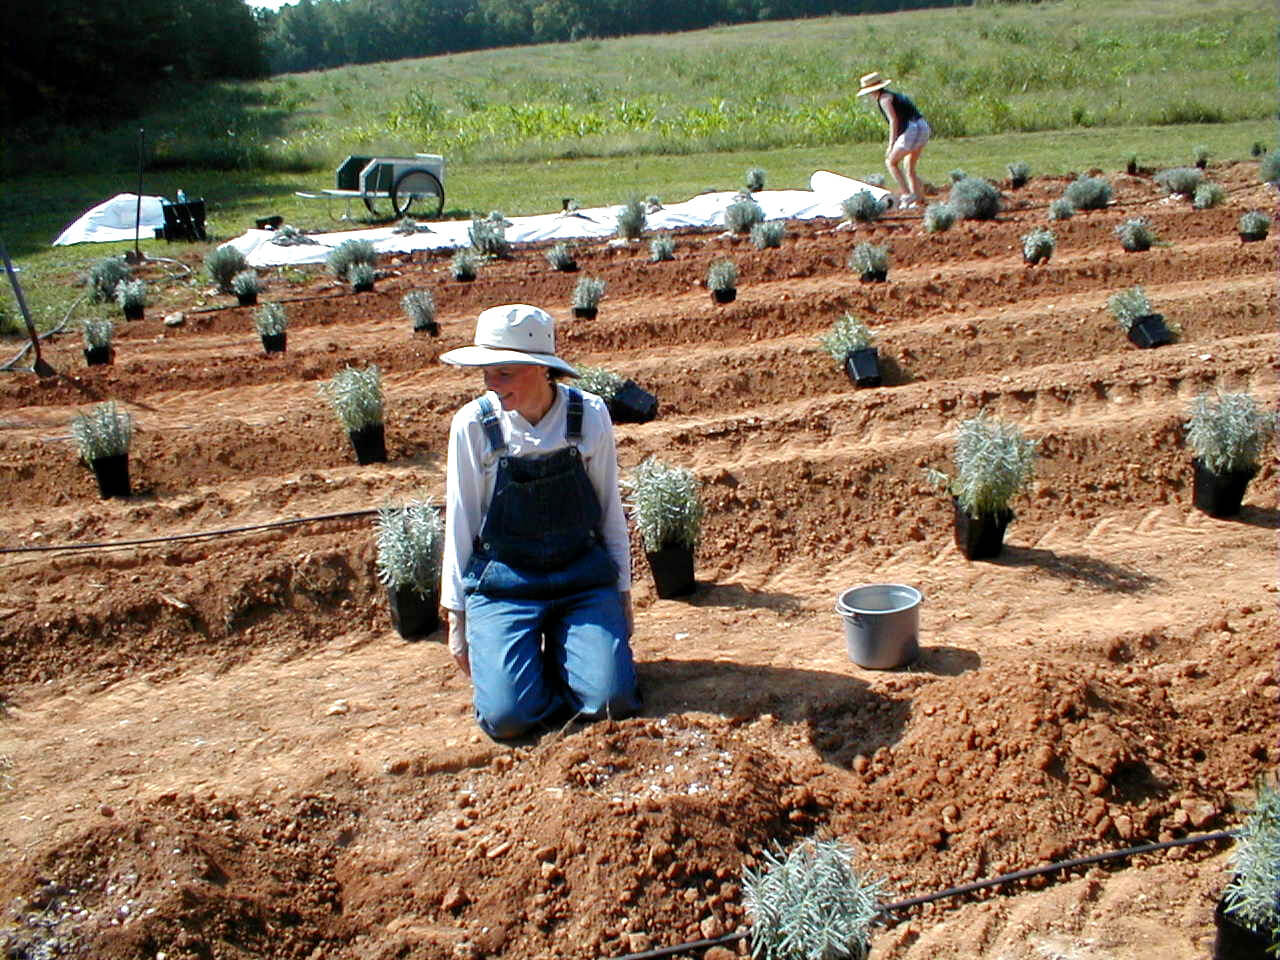 Planting & Care